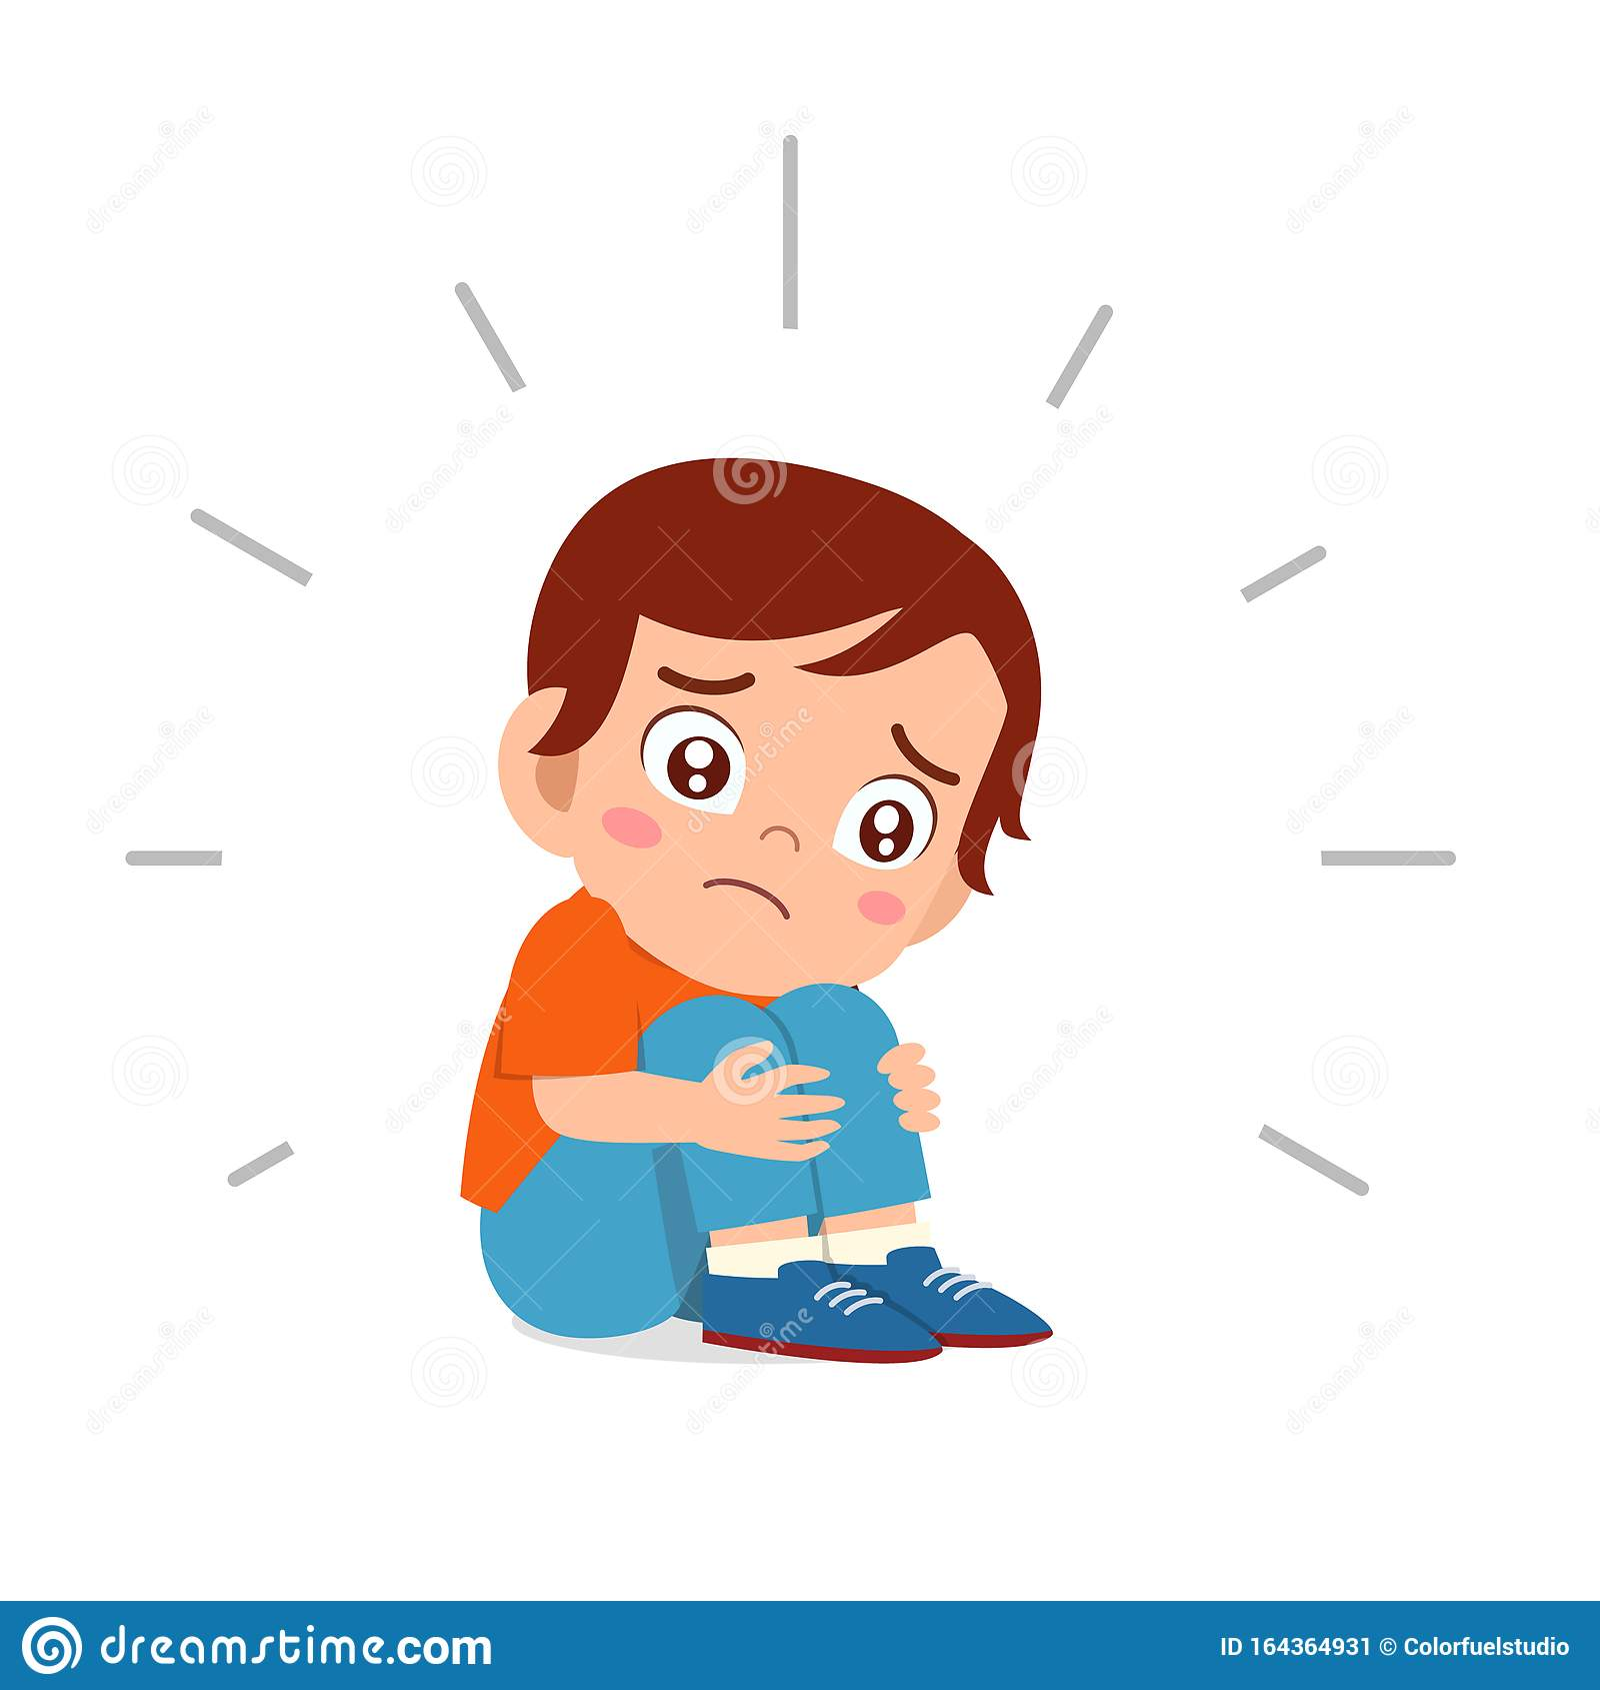 Cute Sad Kid Boy Sitting Alone Scared Stock Illustration Illustration Of Unhappy Depression 164364931